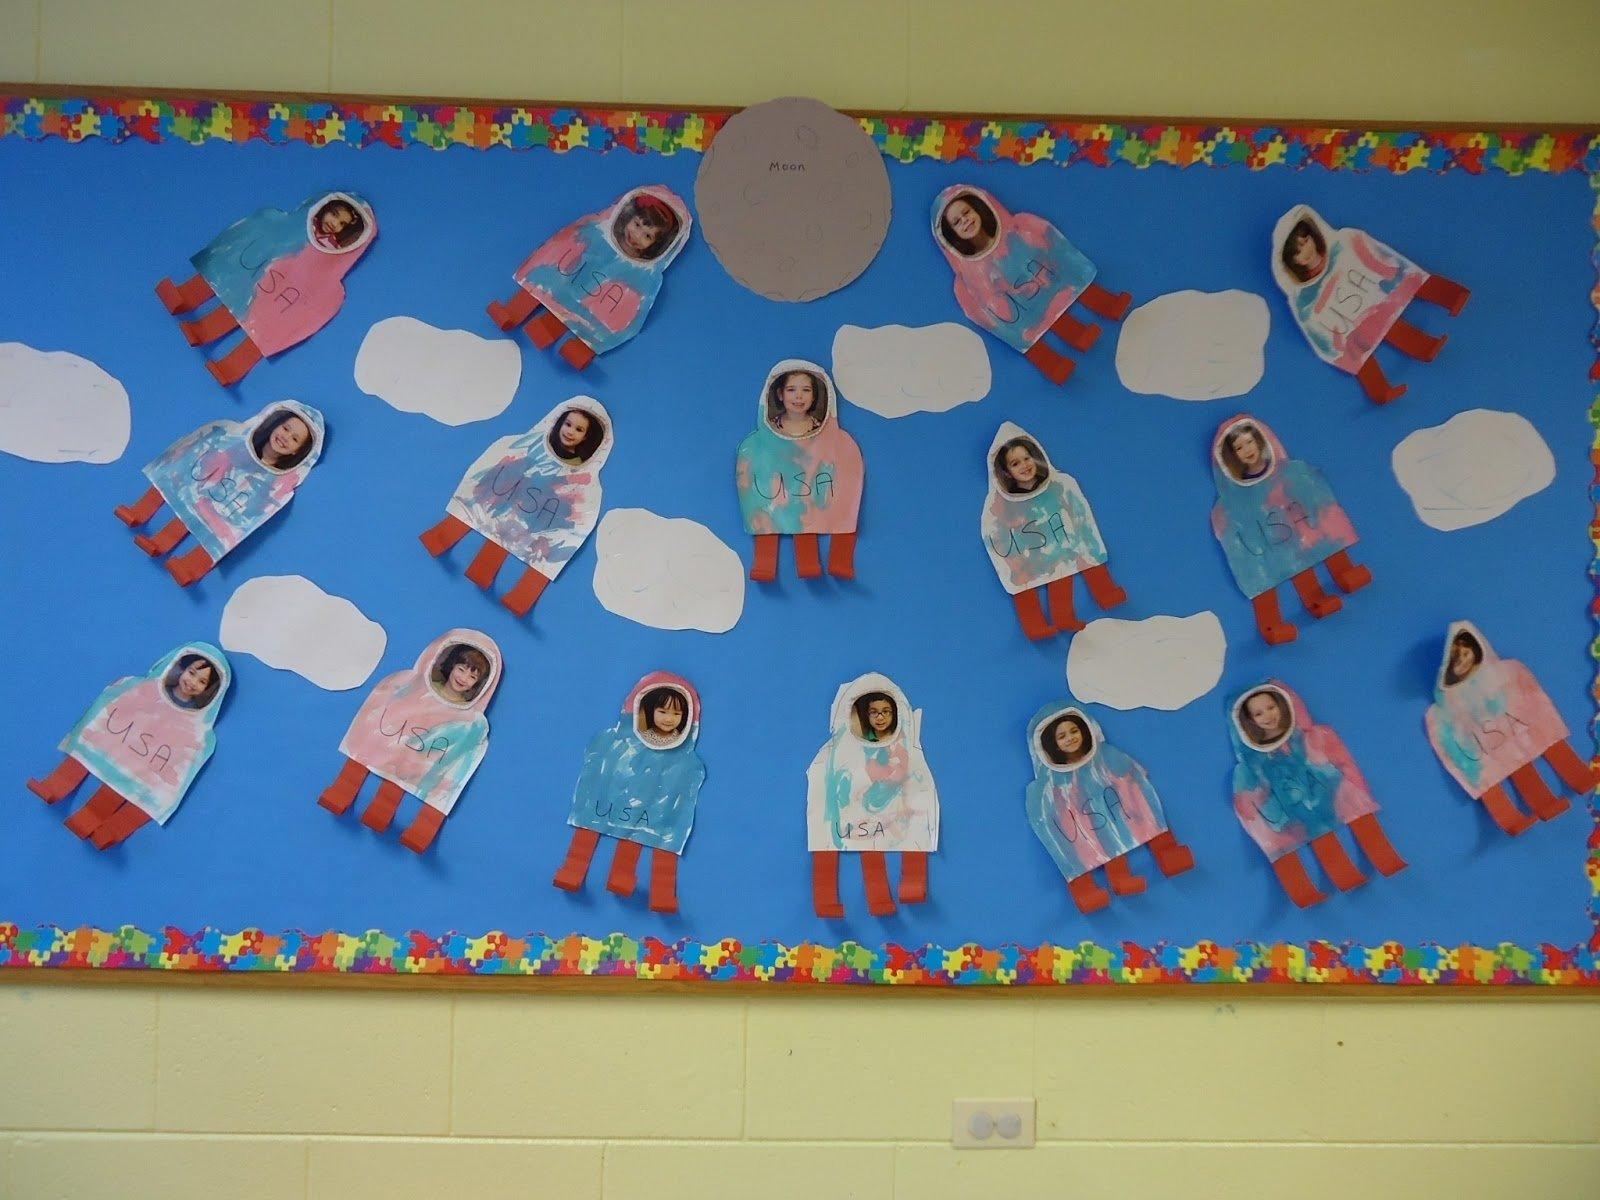 10 Awesome March Preschool Bulletin Board Ideas trinity preschool mount prospect space bulletin board and other 2020